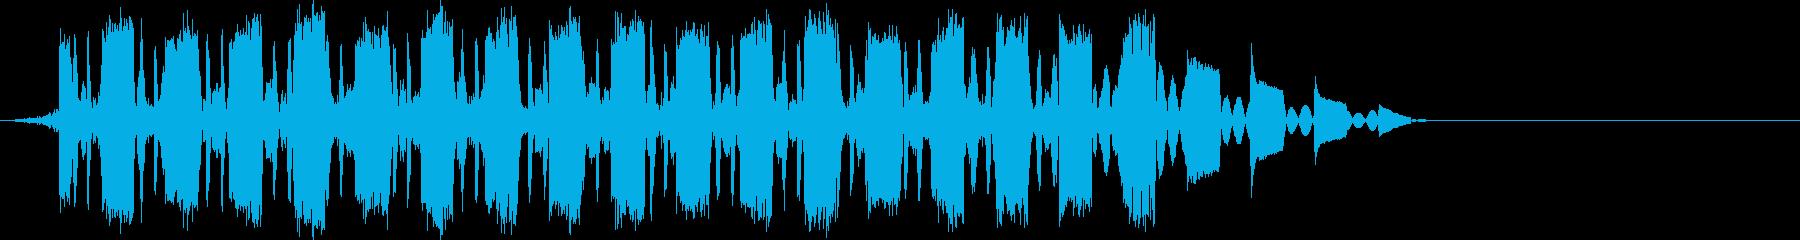 AMGアナログFX 37の再生済みの波形